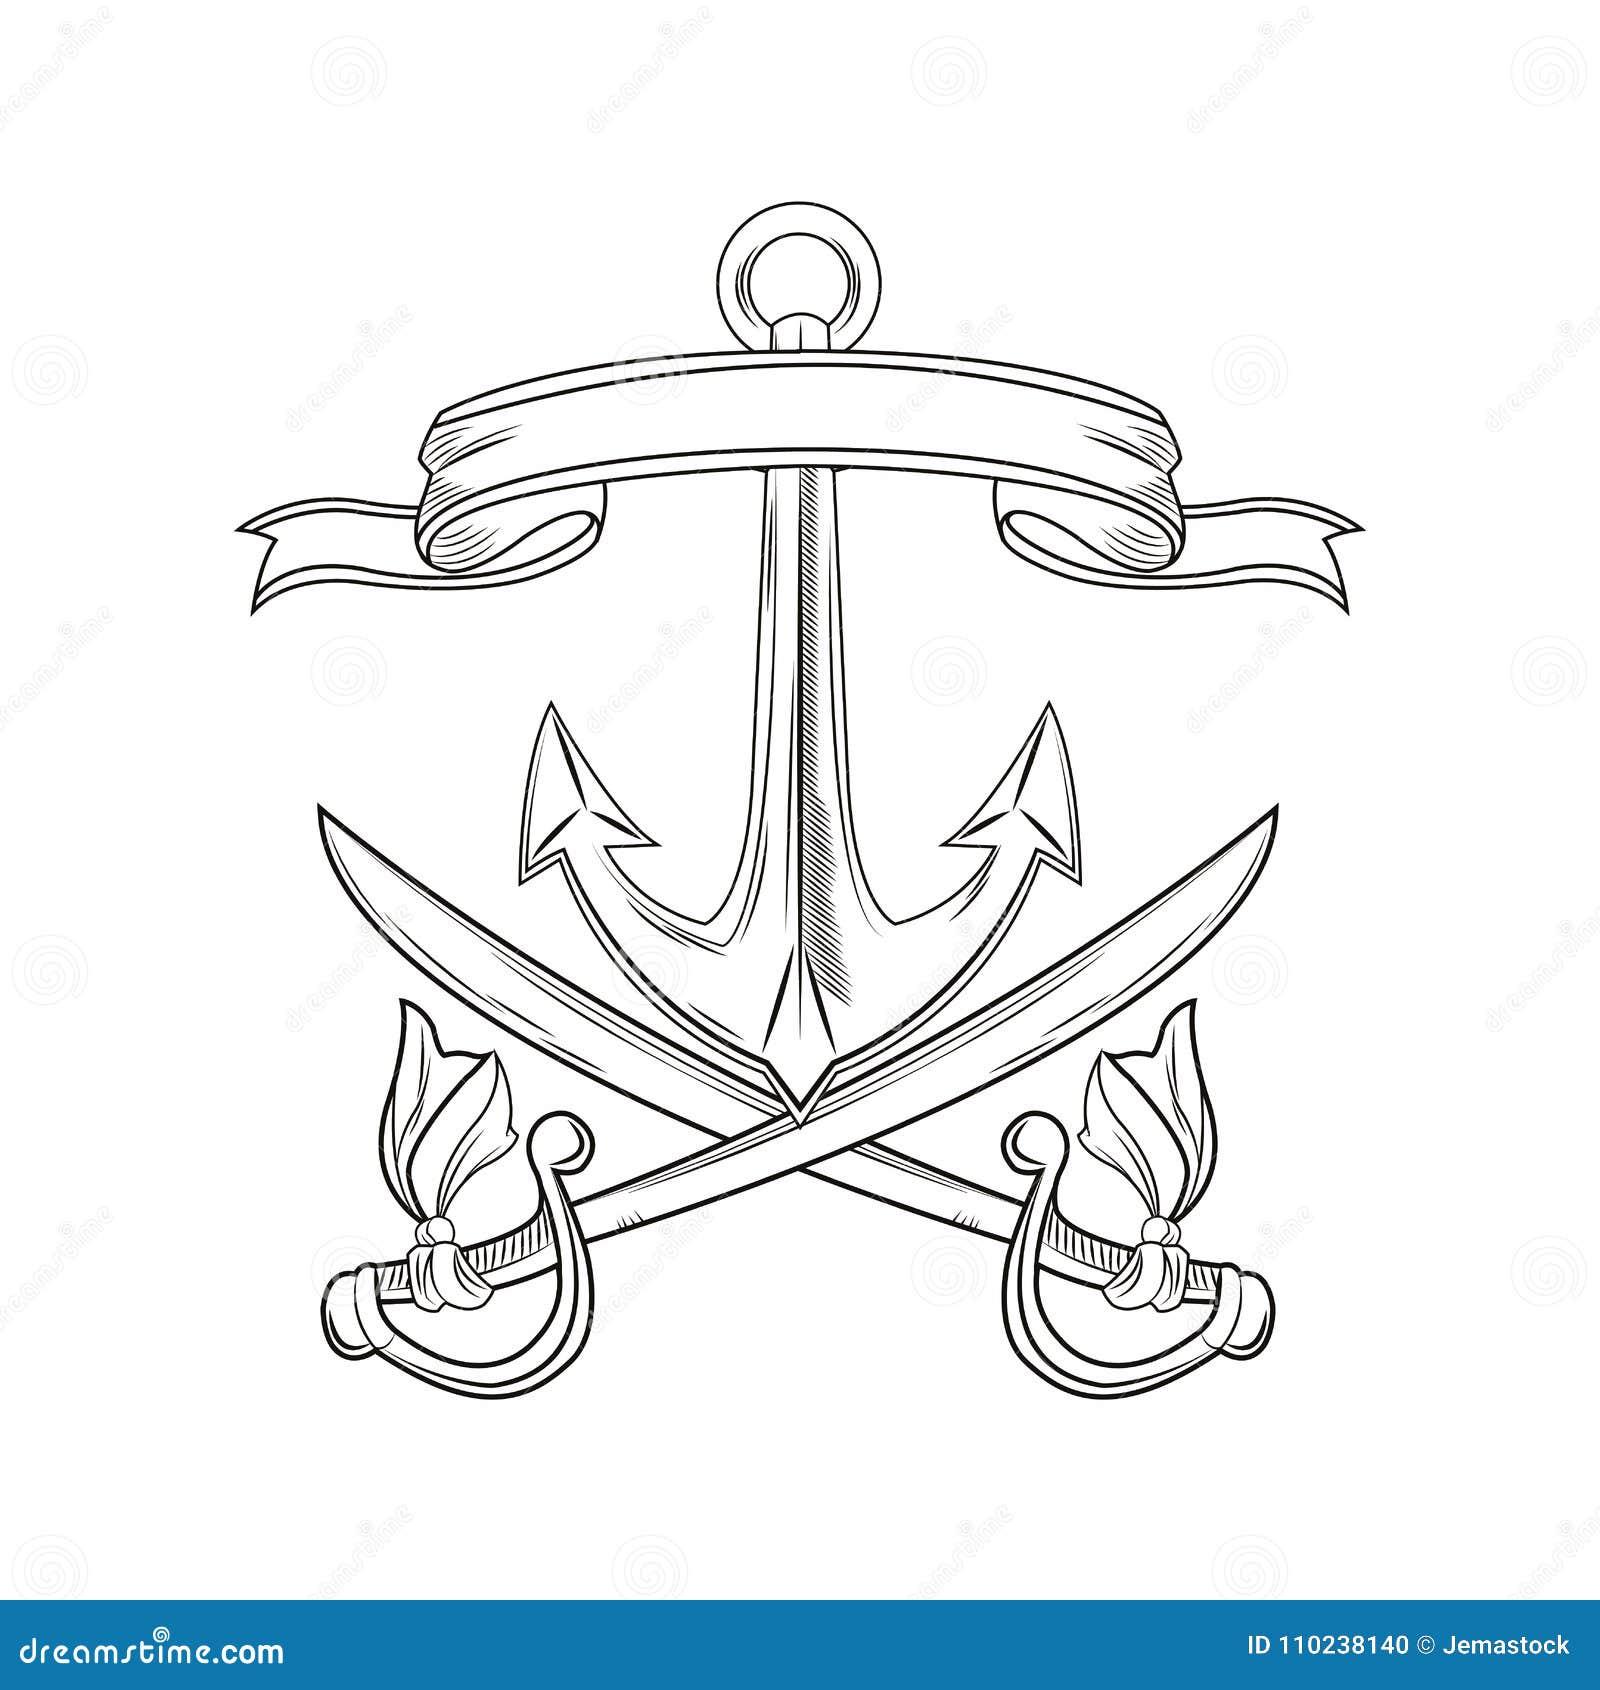 Cartoon Pirate Tattoo Design Stock Vector Illustration Of Studio